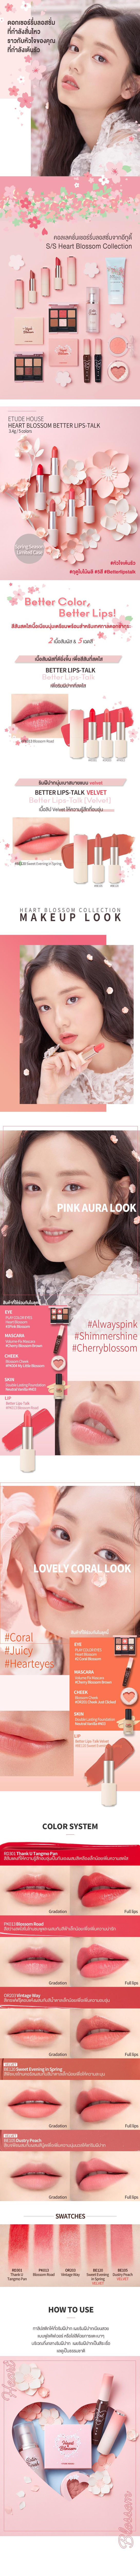 TH1_Heart_blossom_better lipstalk